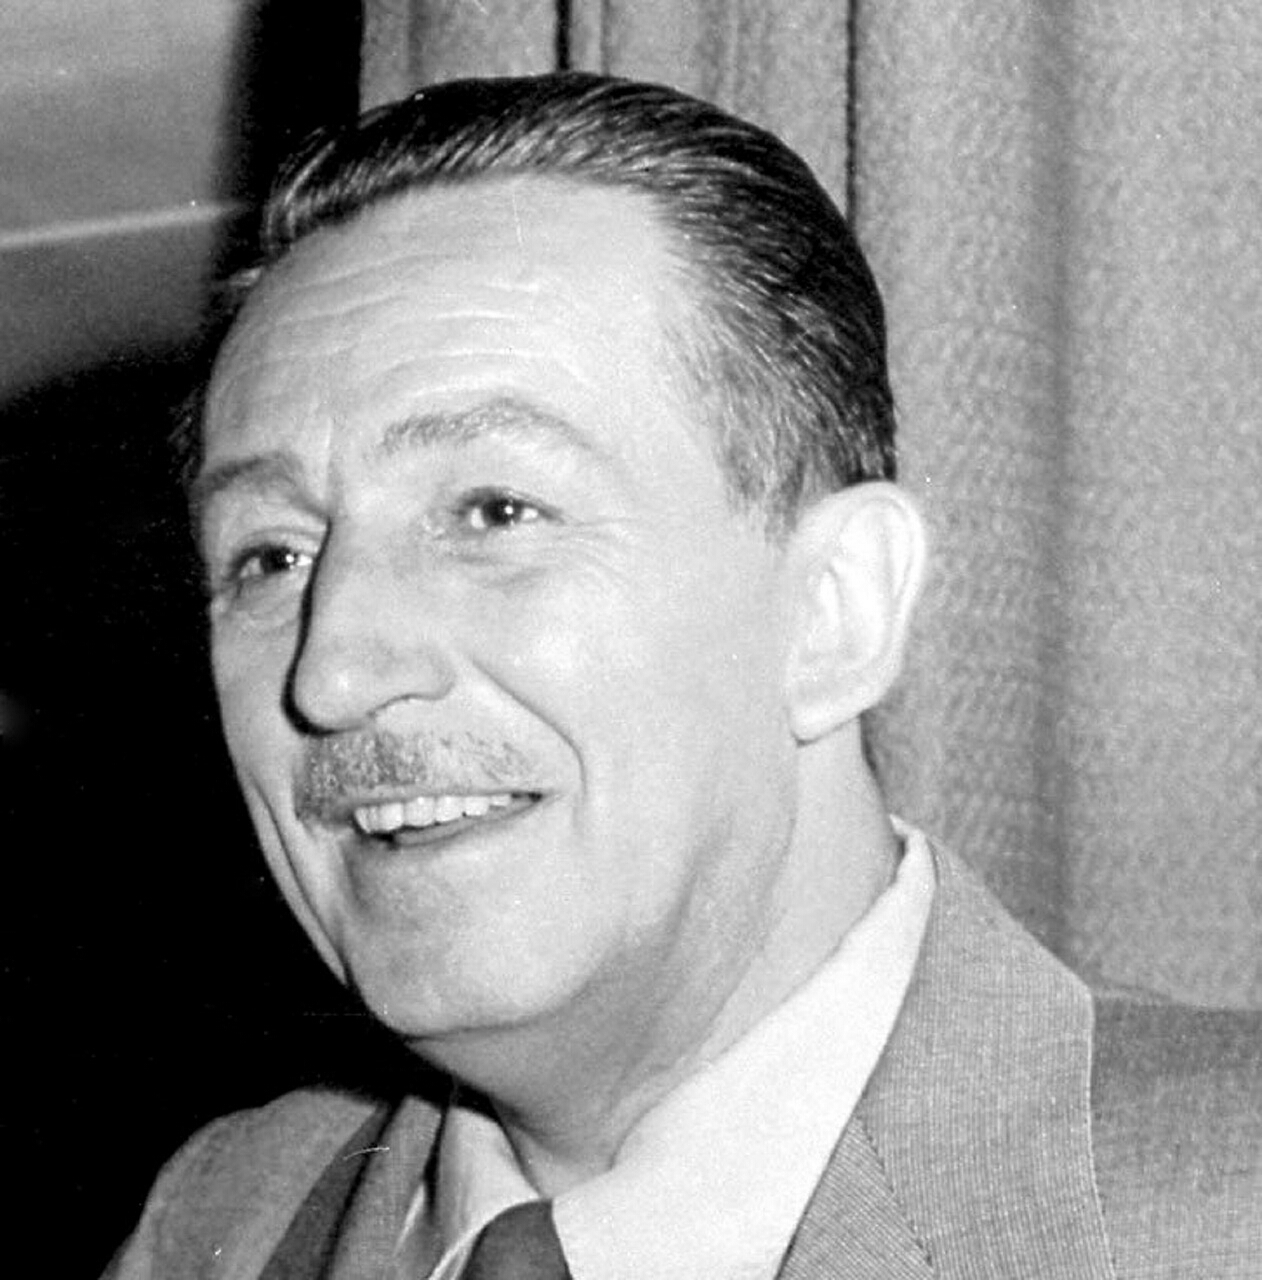 Walt Disney's life